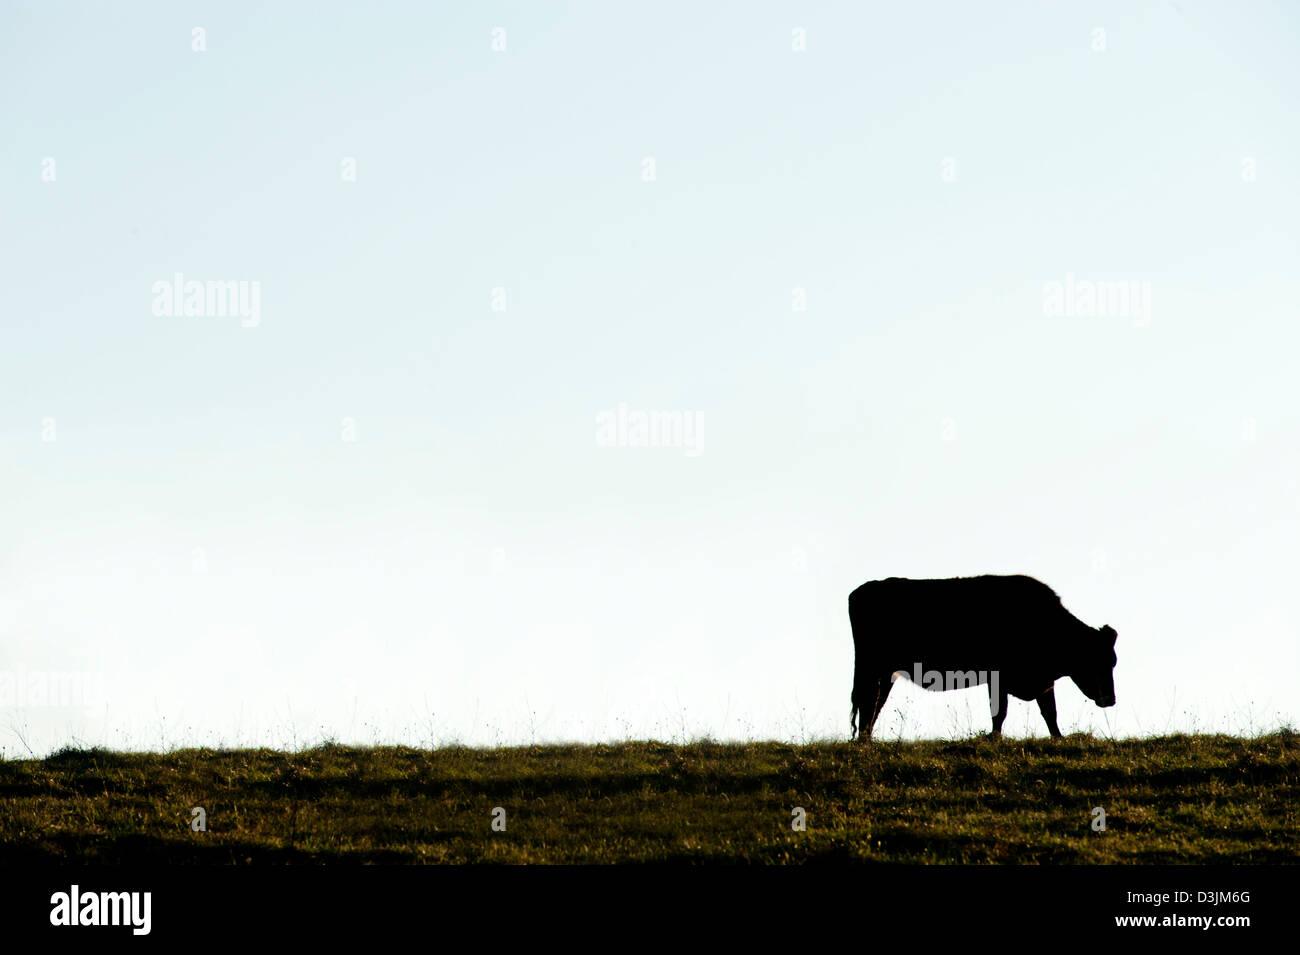 Solo vaca siluetas contra un cielo azul claro Imagen De Stock